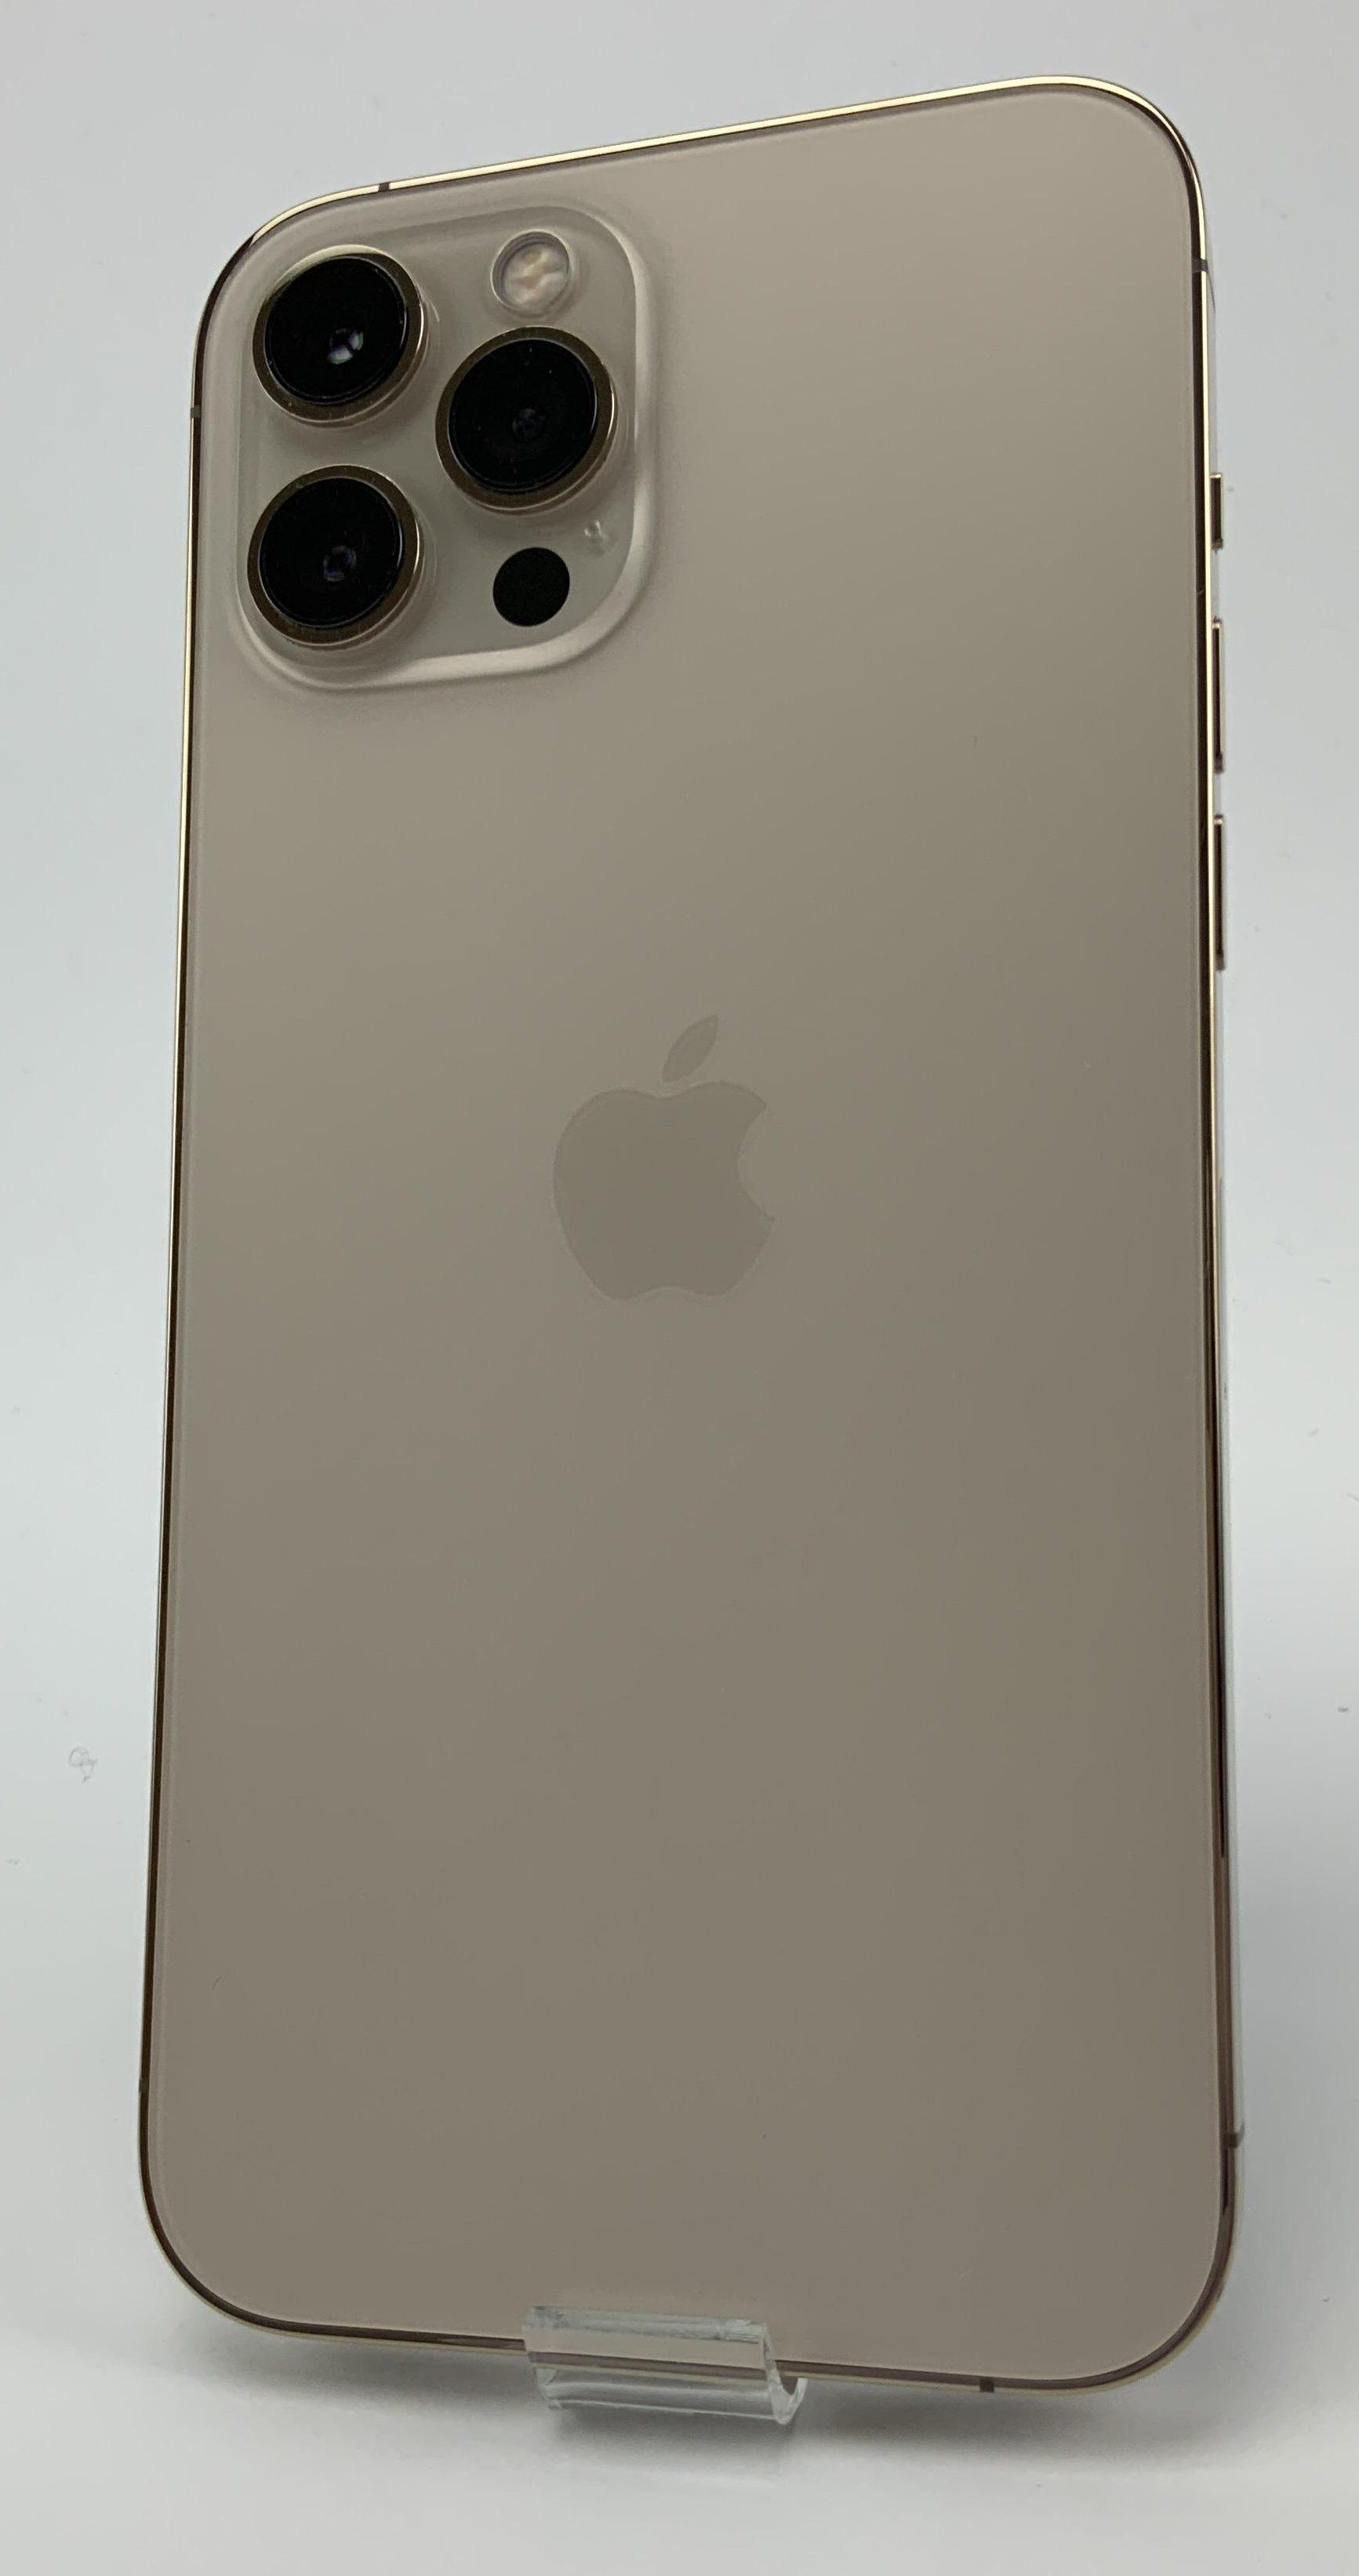 iPhone 12 Pro Max 256GB, 256GB, Gold, Bild 2